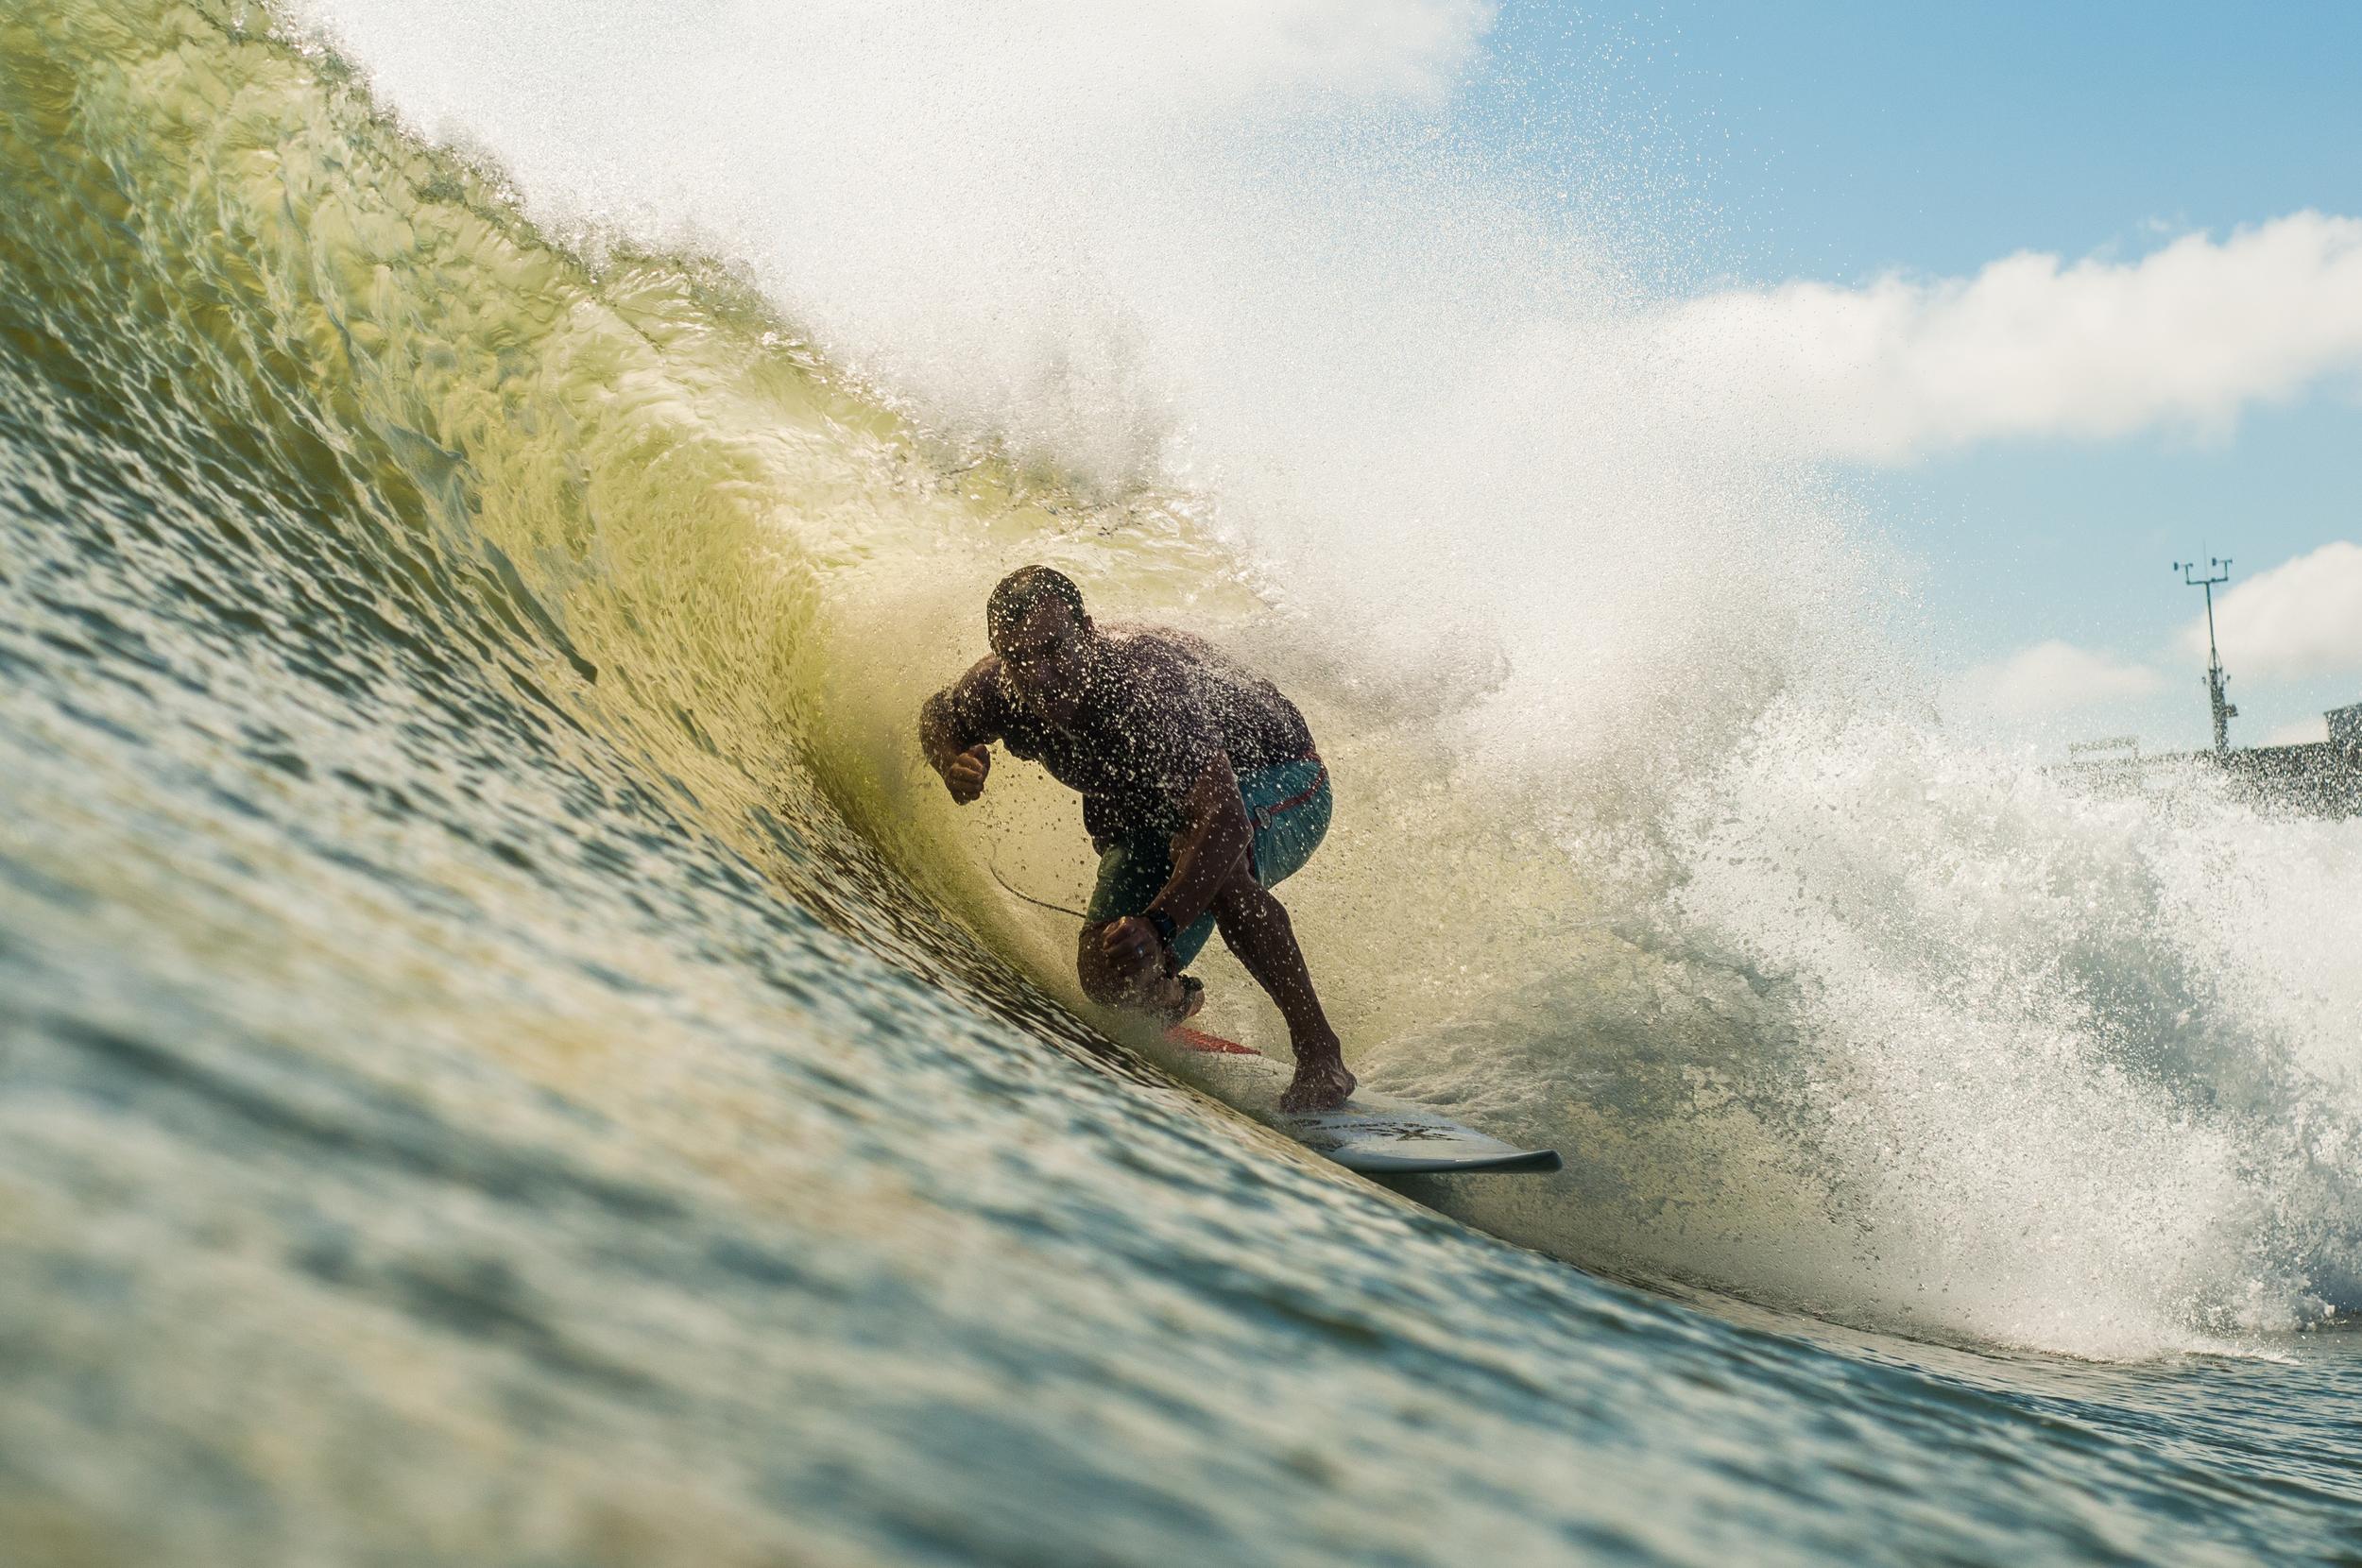 Peace out! Surfer | Gabe Kling